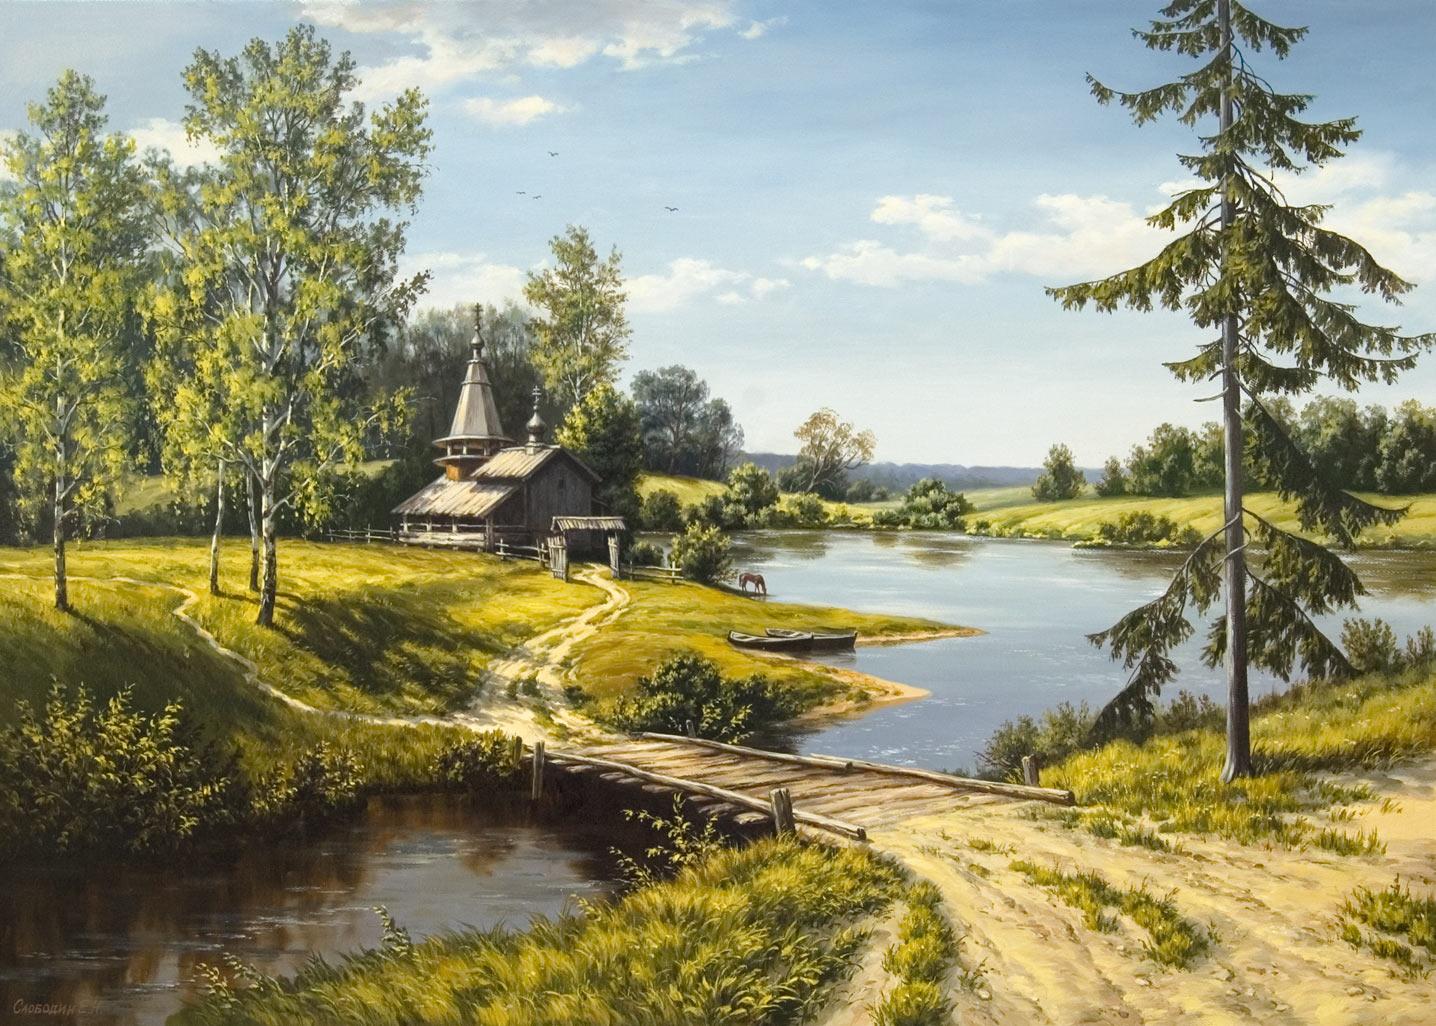 000,00 руб Купить картину Купить картину ...: www.gallery-tver.ru/paintings/landscape-50.html